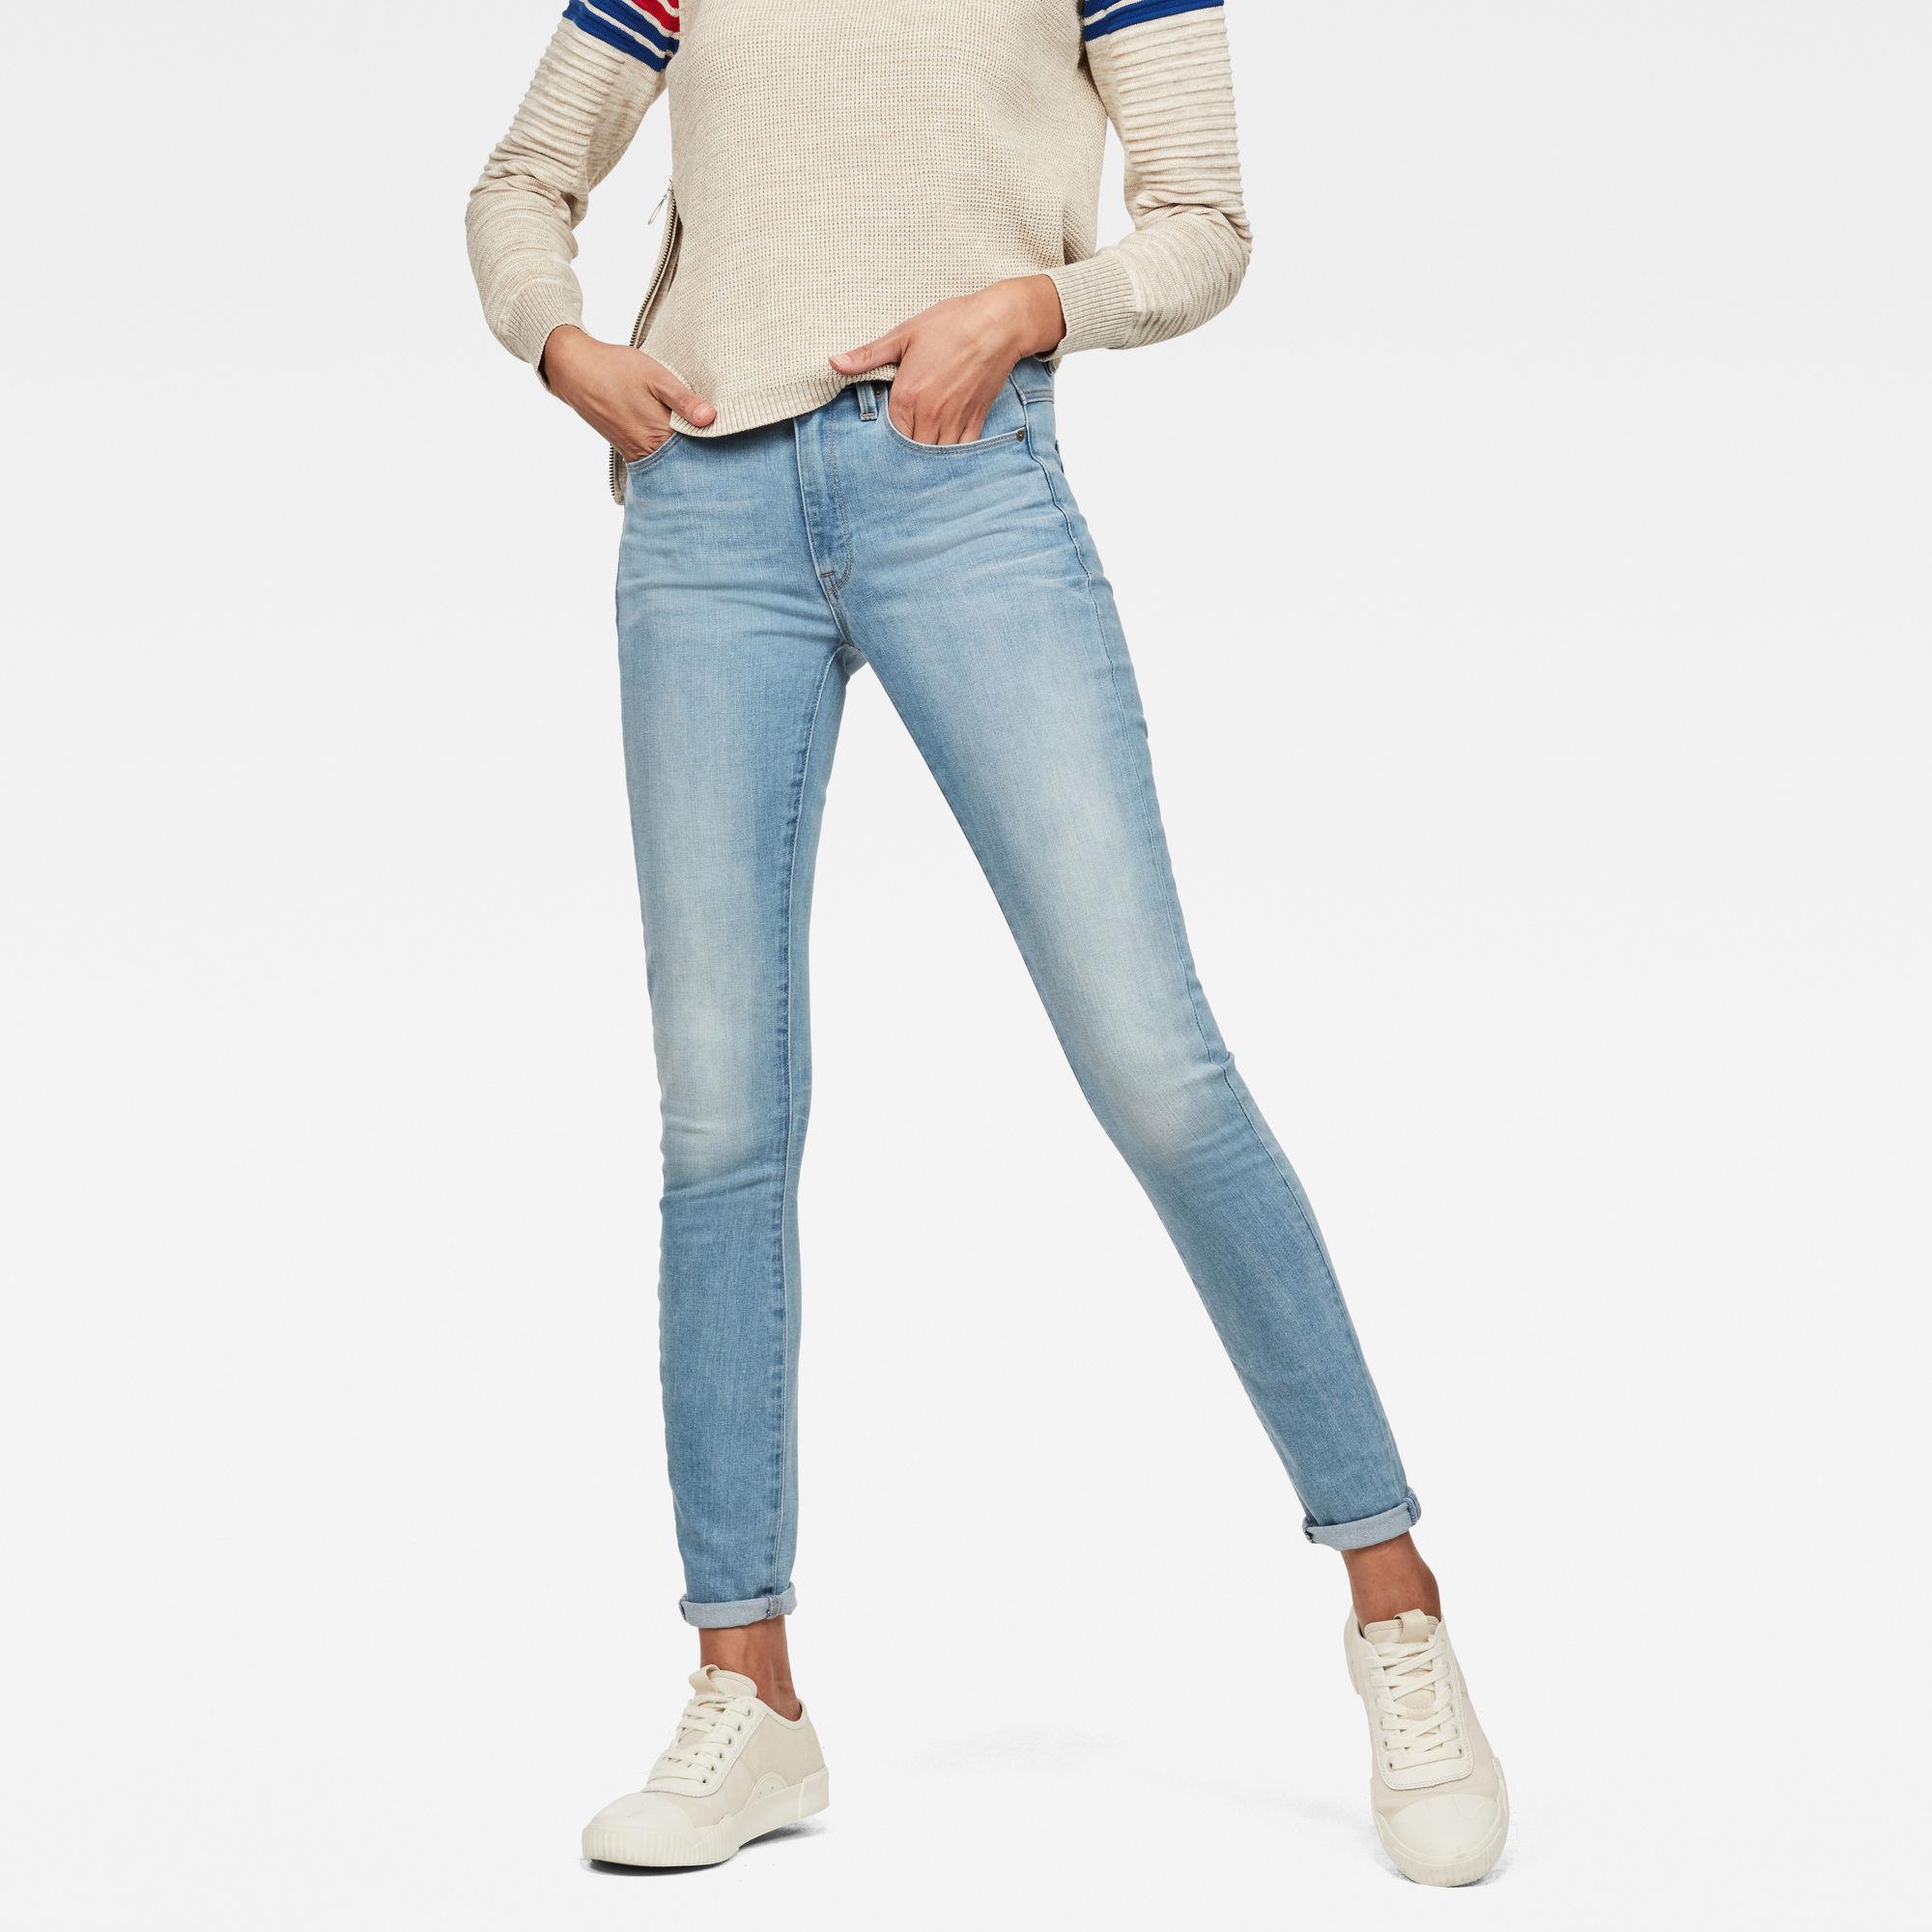 Image of G Star Raw 3301 High Waist Skinny Jeans